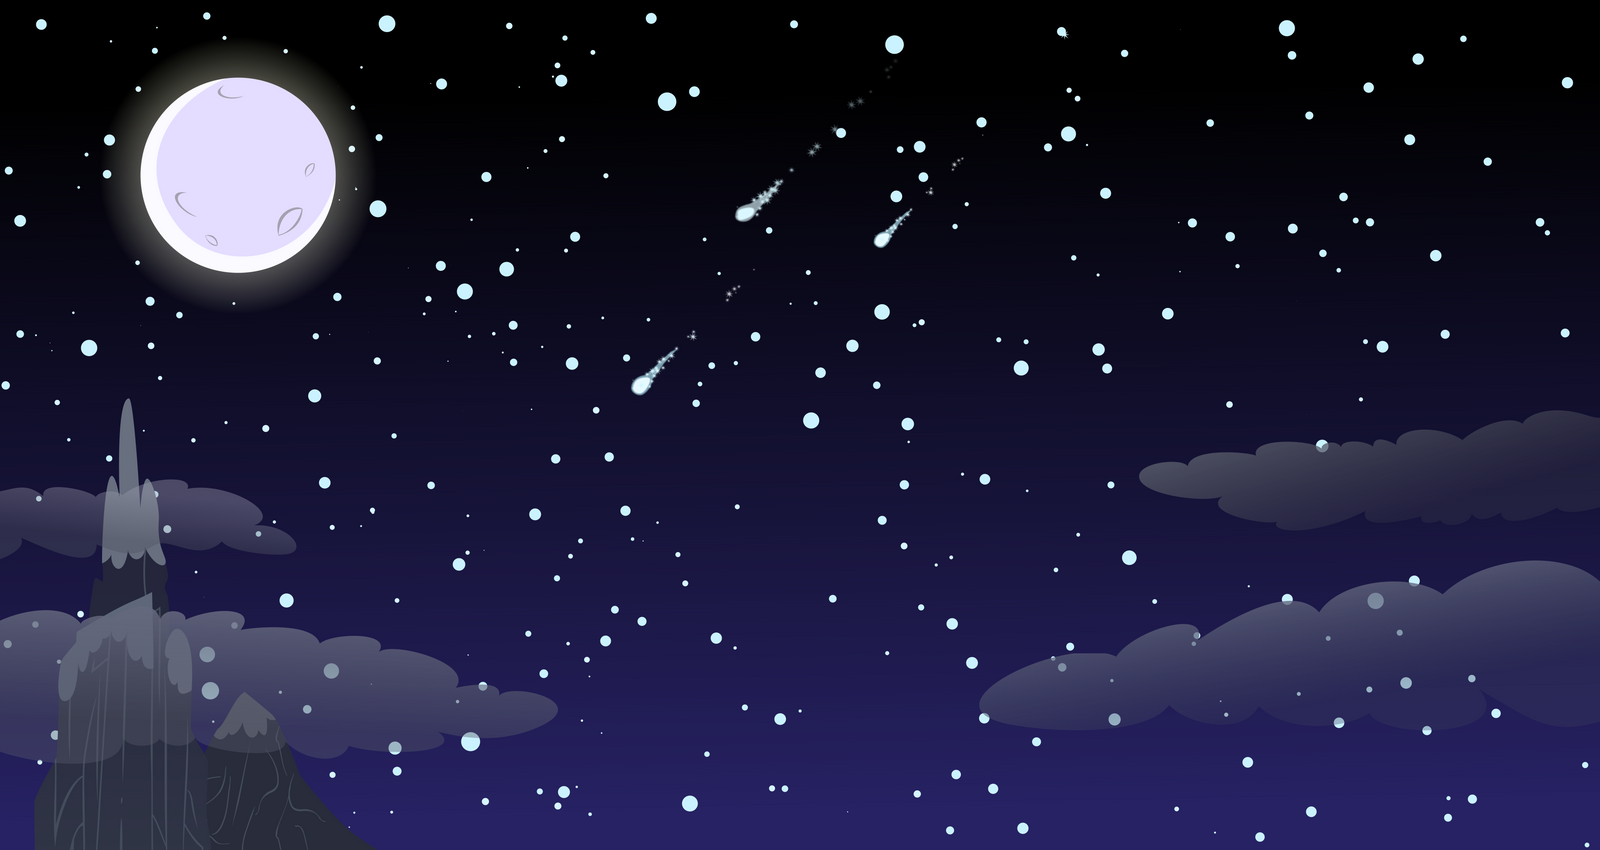 Night Background by Proenix on DeviantArt